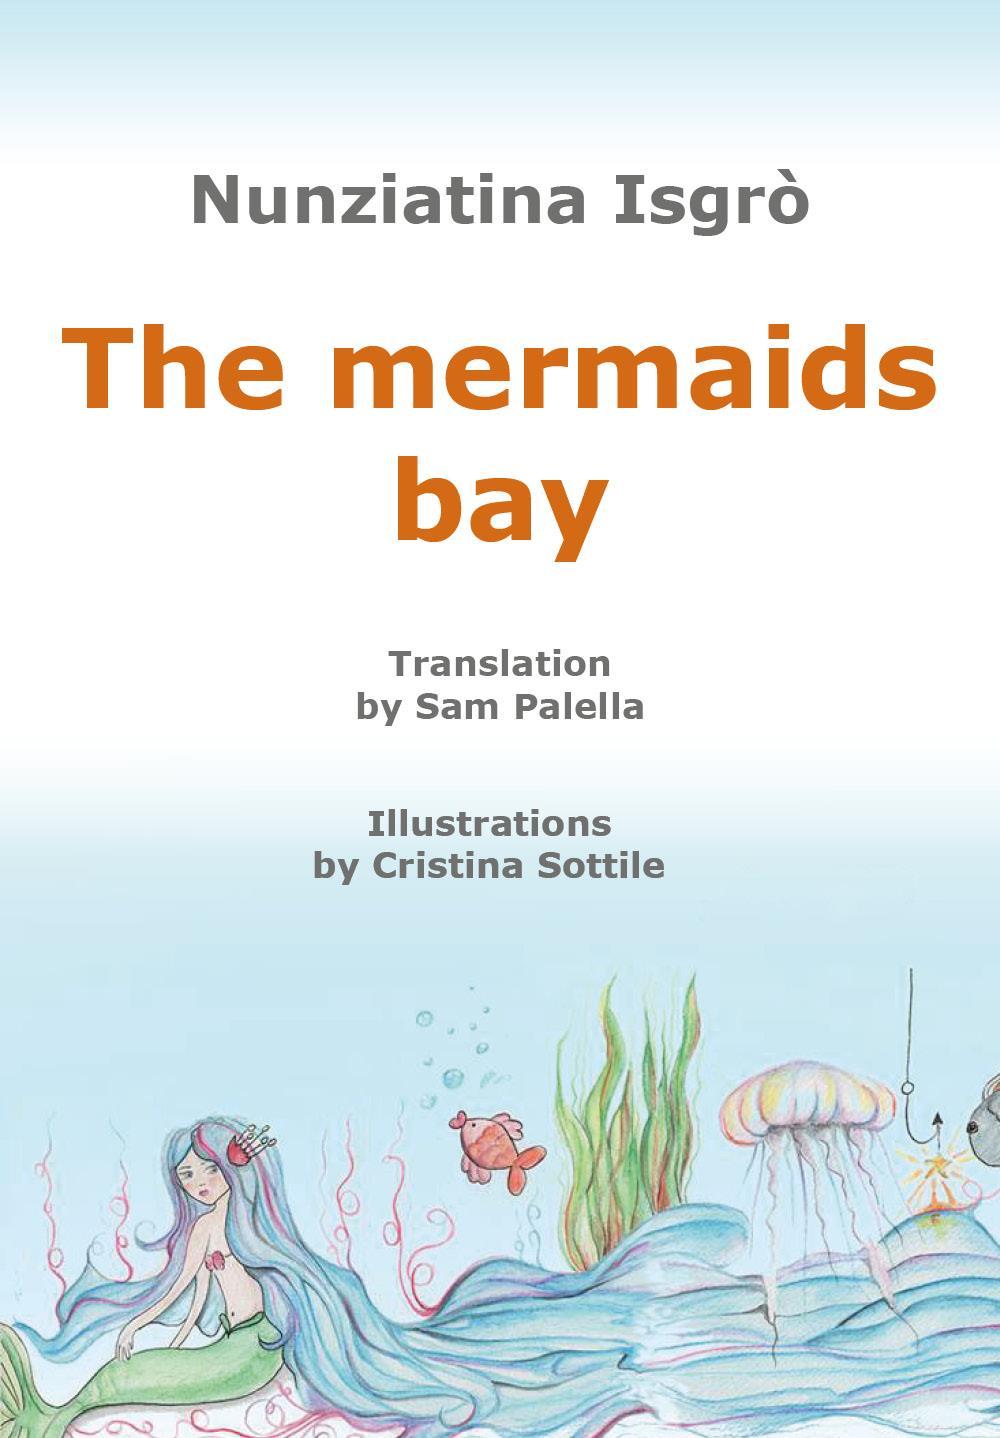 The mermaids bay